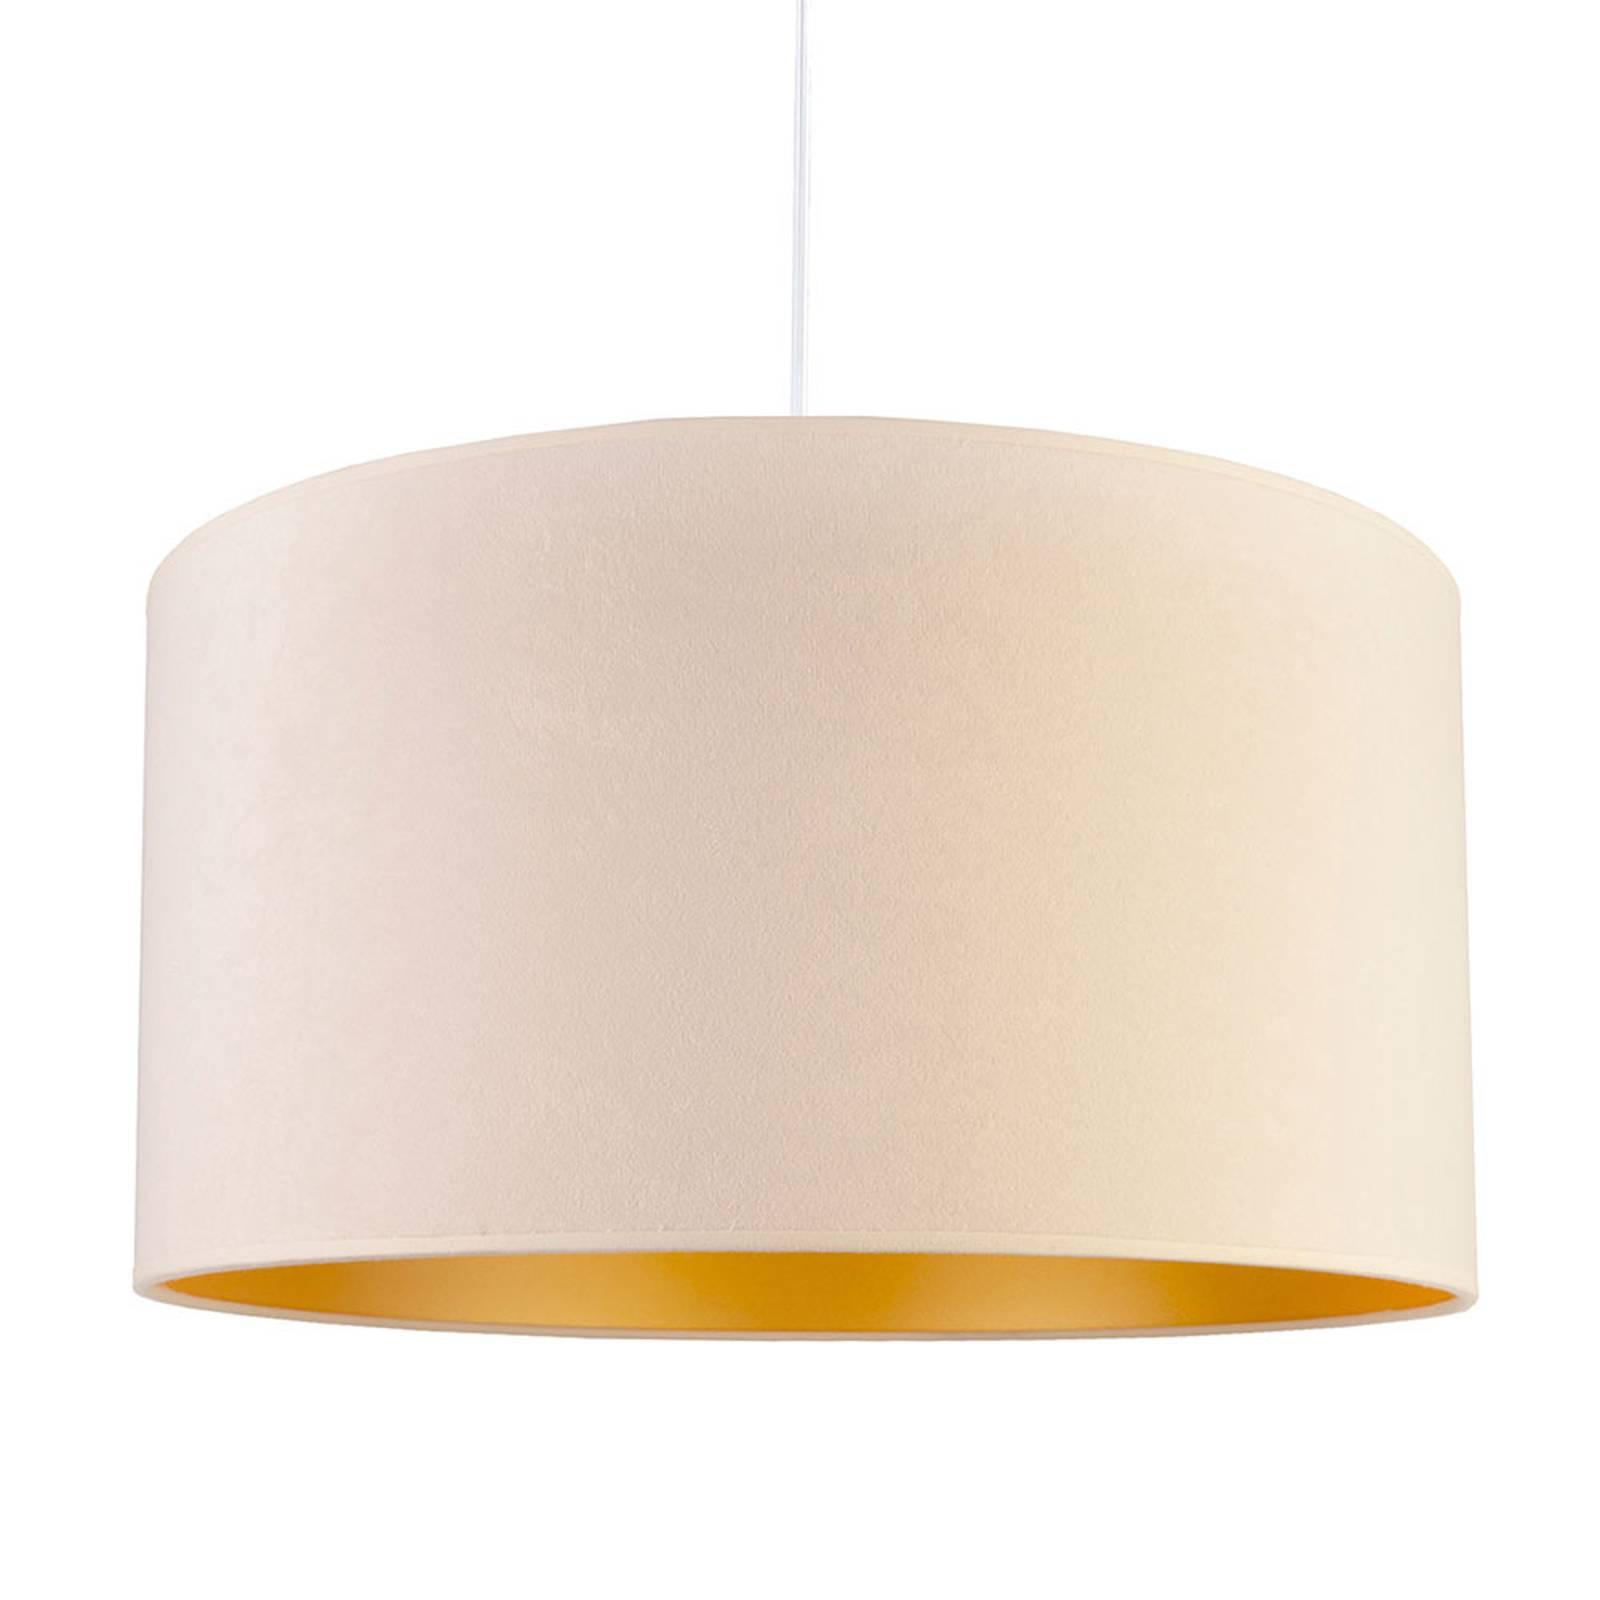 Hanglamp Roller, wit/goud